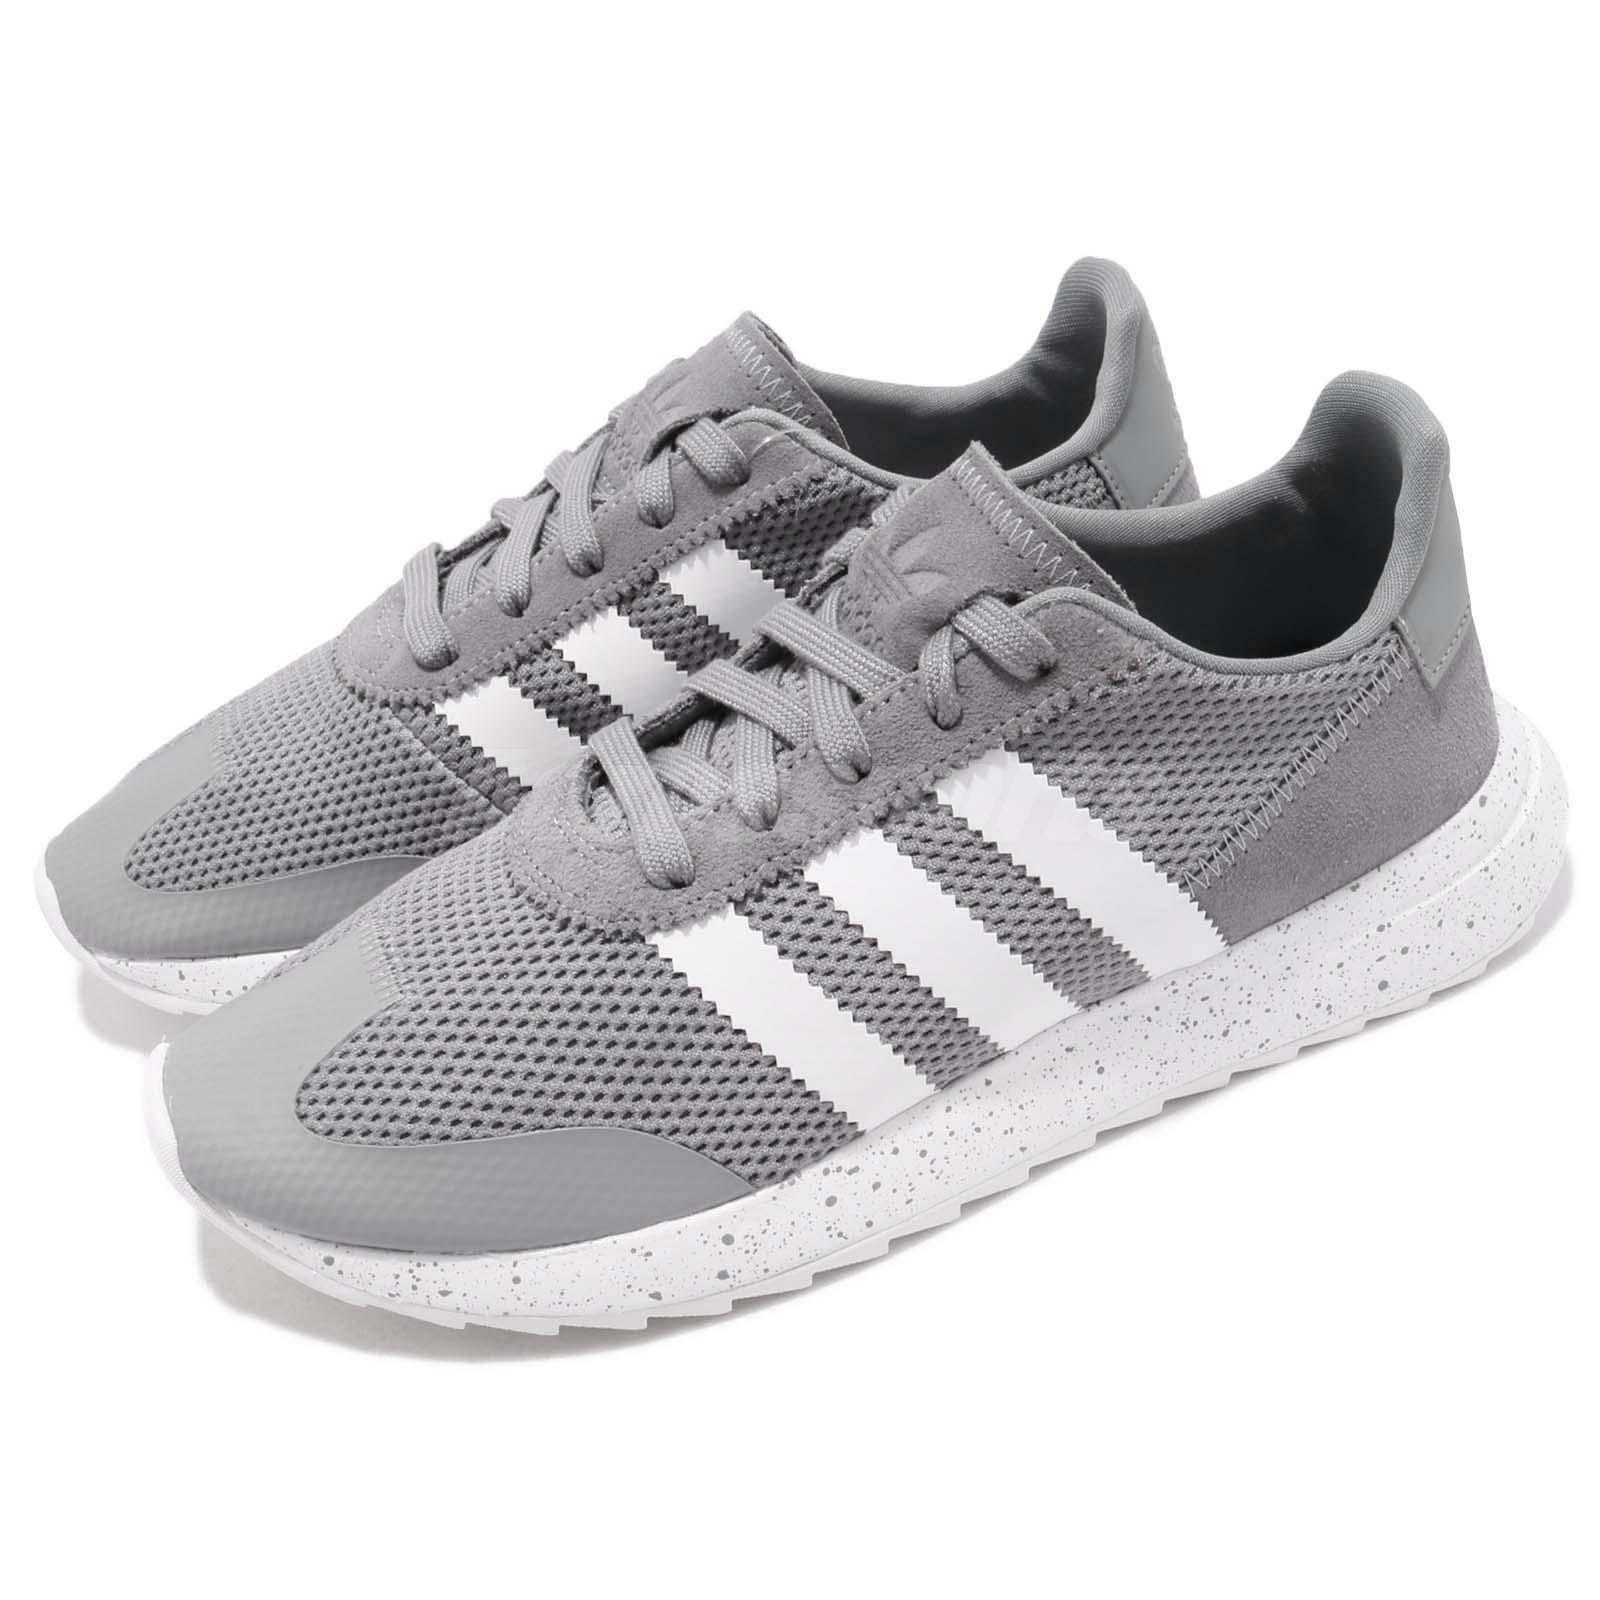 huge discount b46b9 cc194 Details about adidas Originals FLBRunner W Grey White Women Running Shoes  Sneakers CQ1968